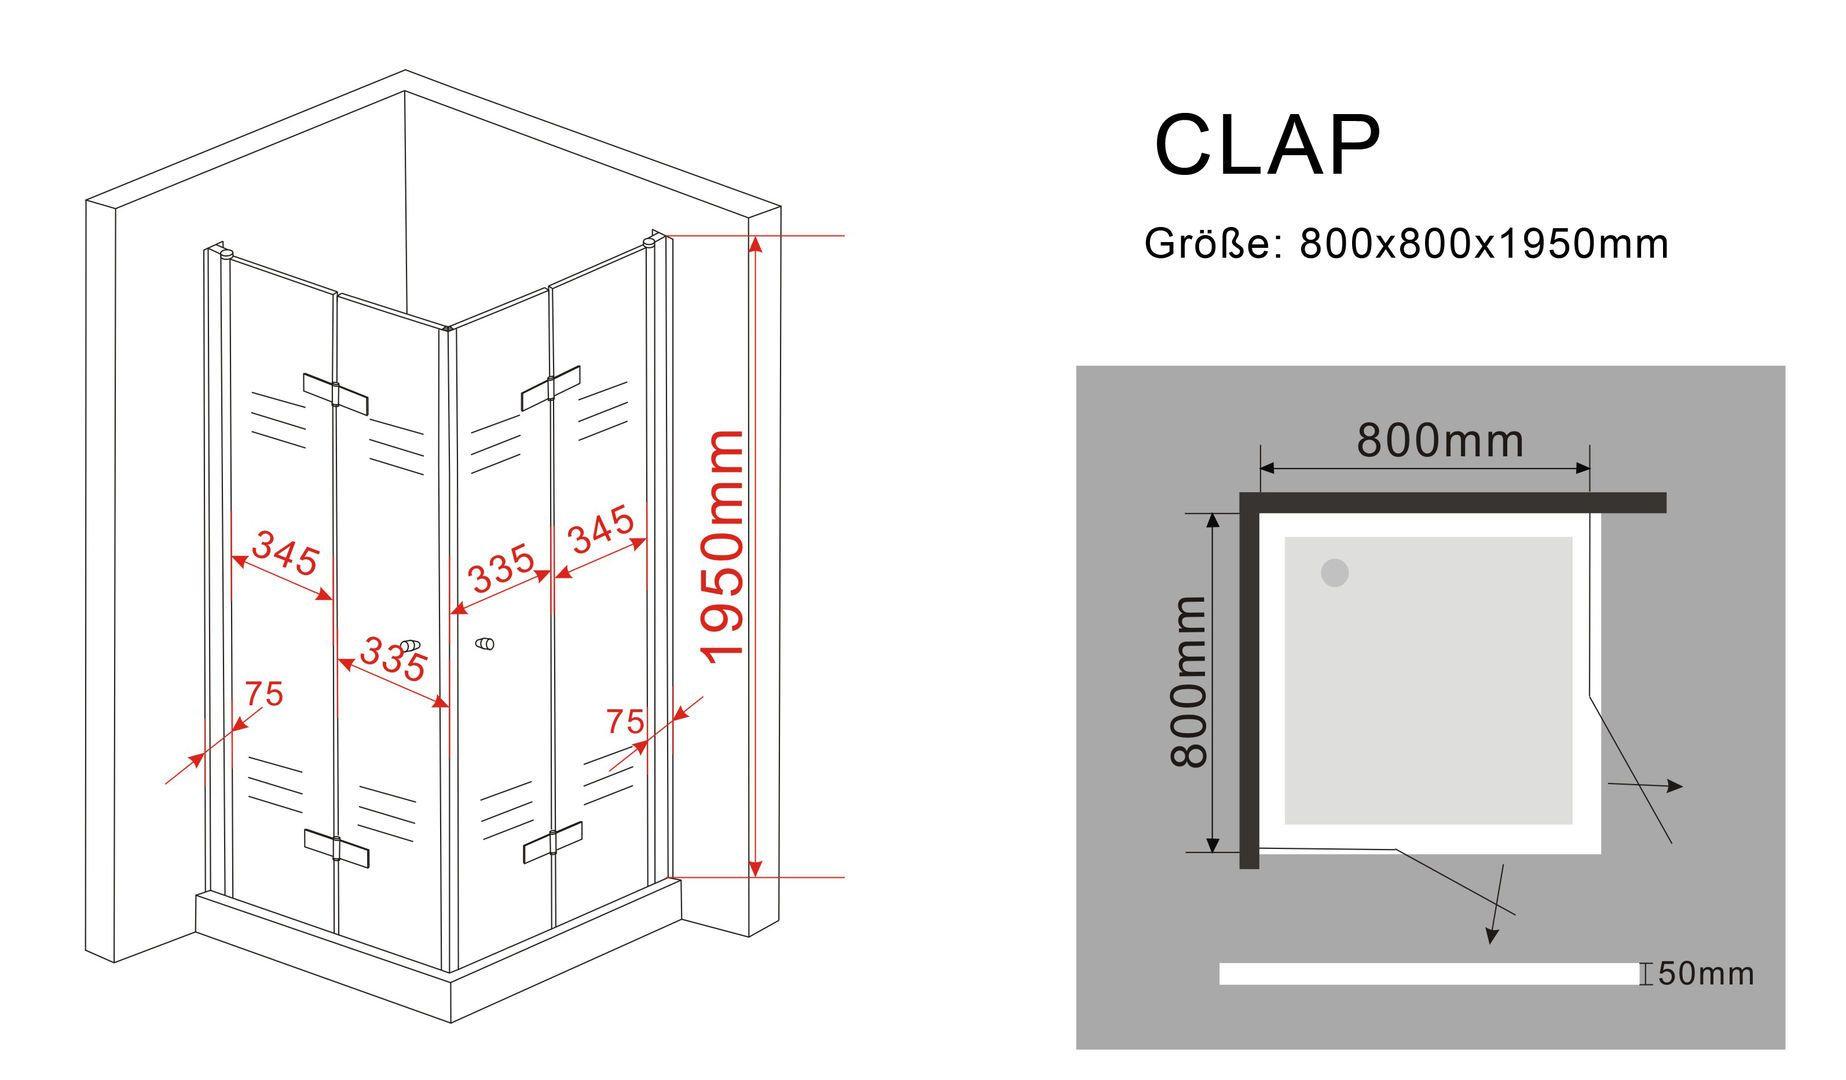 duschkabine clap 80 x 80 x 200 cm inkl duschtasse glasdeals. Black Bedroom Furniture Sets. Home Design Ideas